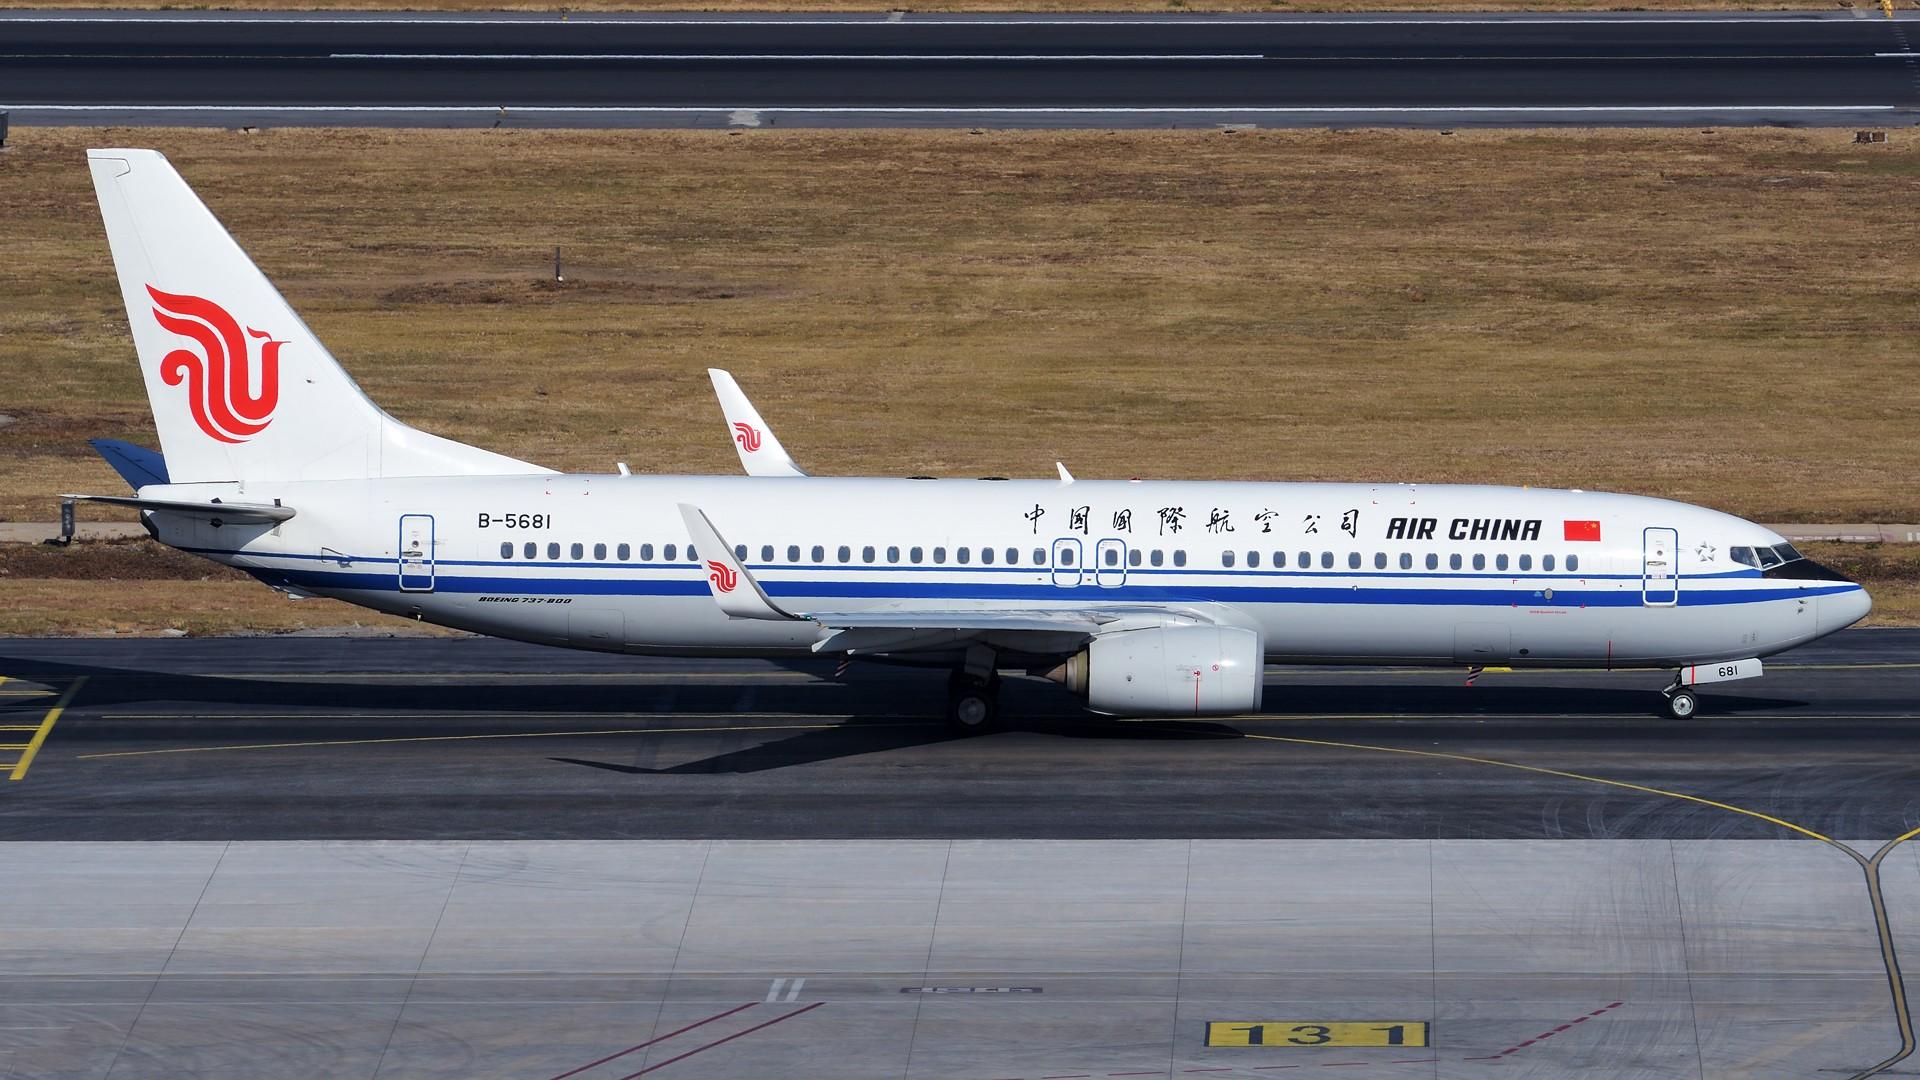 Re:[原创]★[DLC]一点有趣的事情(持续更新中)★ BOEING 737-800 B-5681 中国大连国际机场